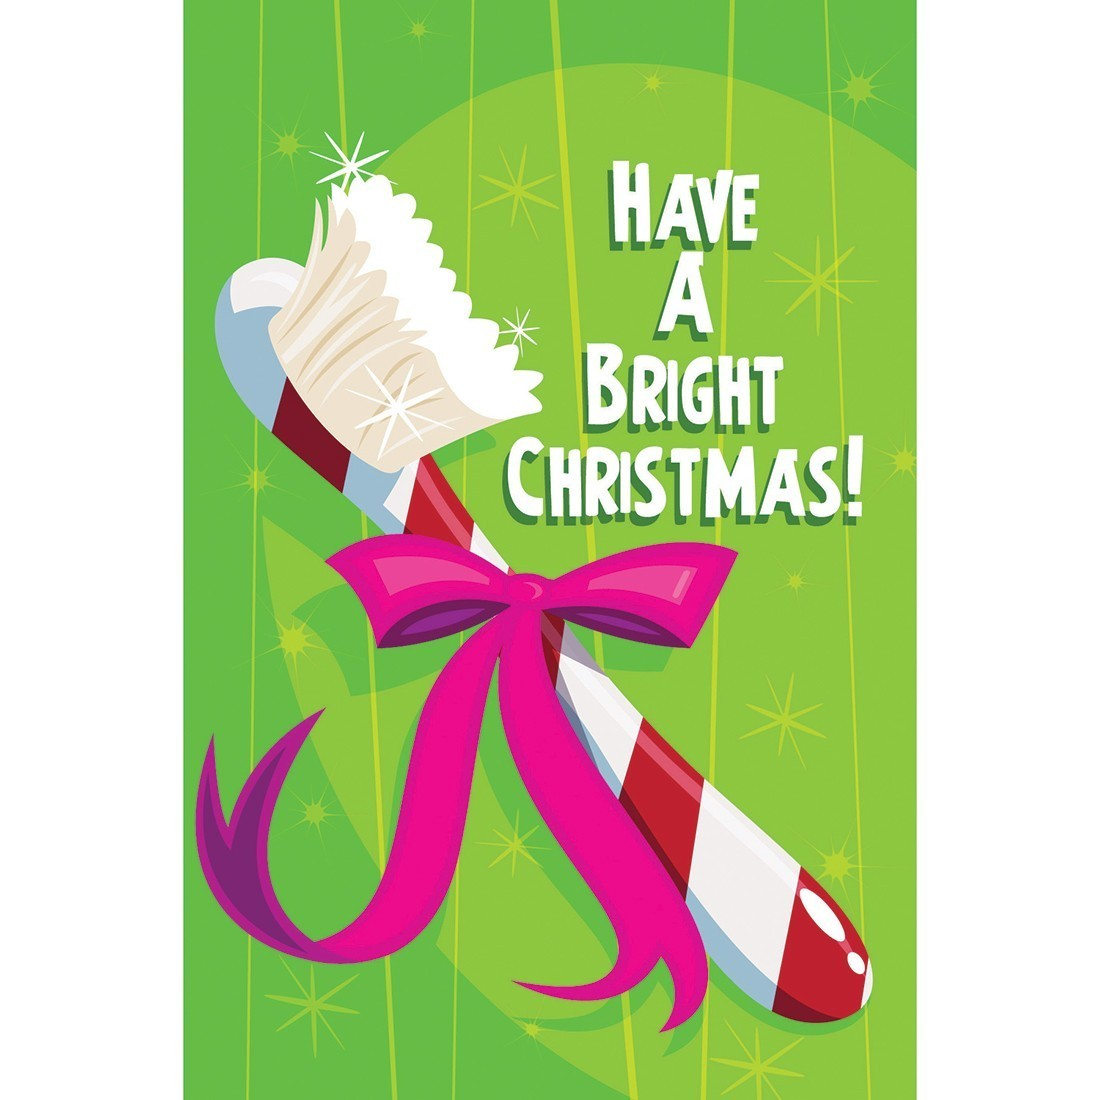 Bright Christmas Toothbrush Greeting Cards [image]